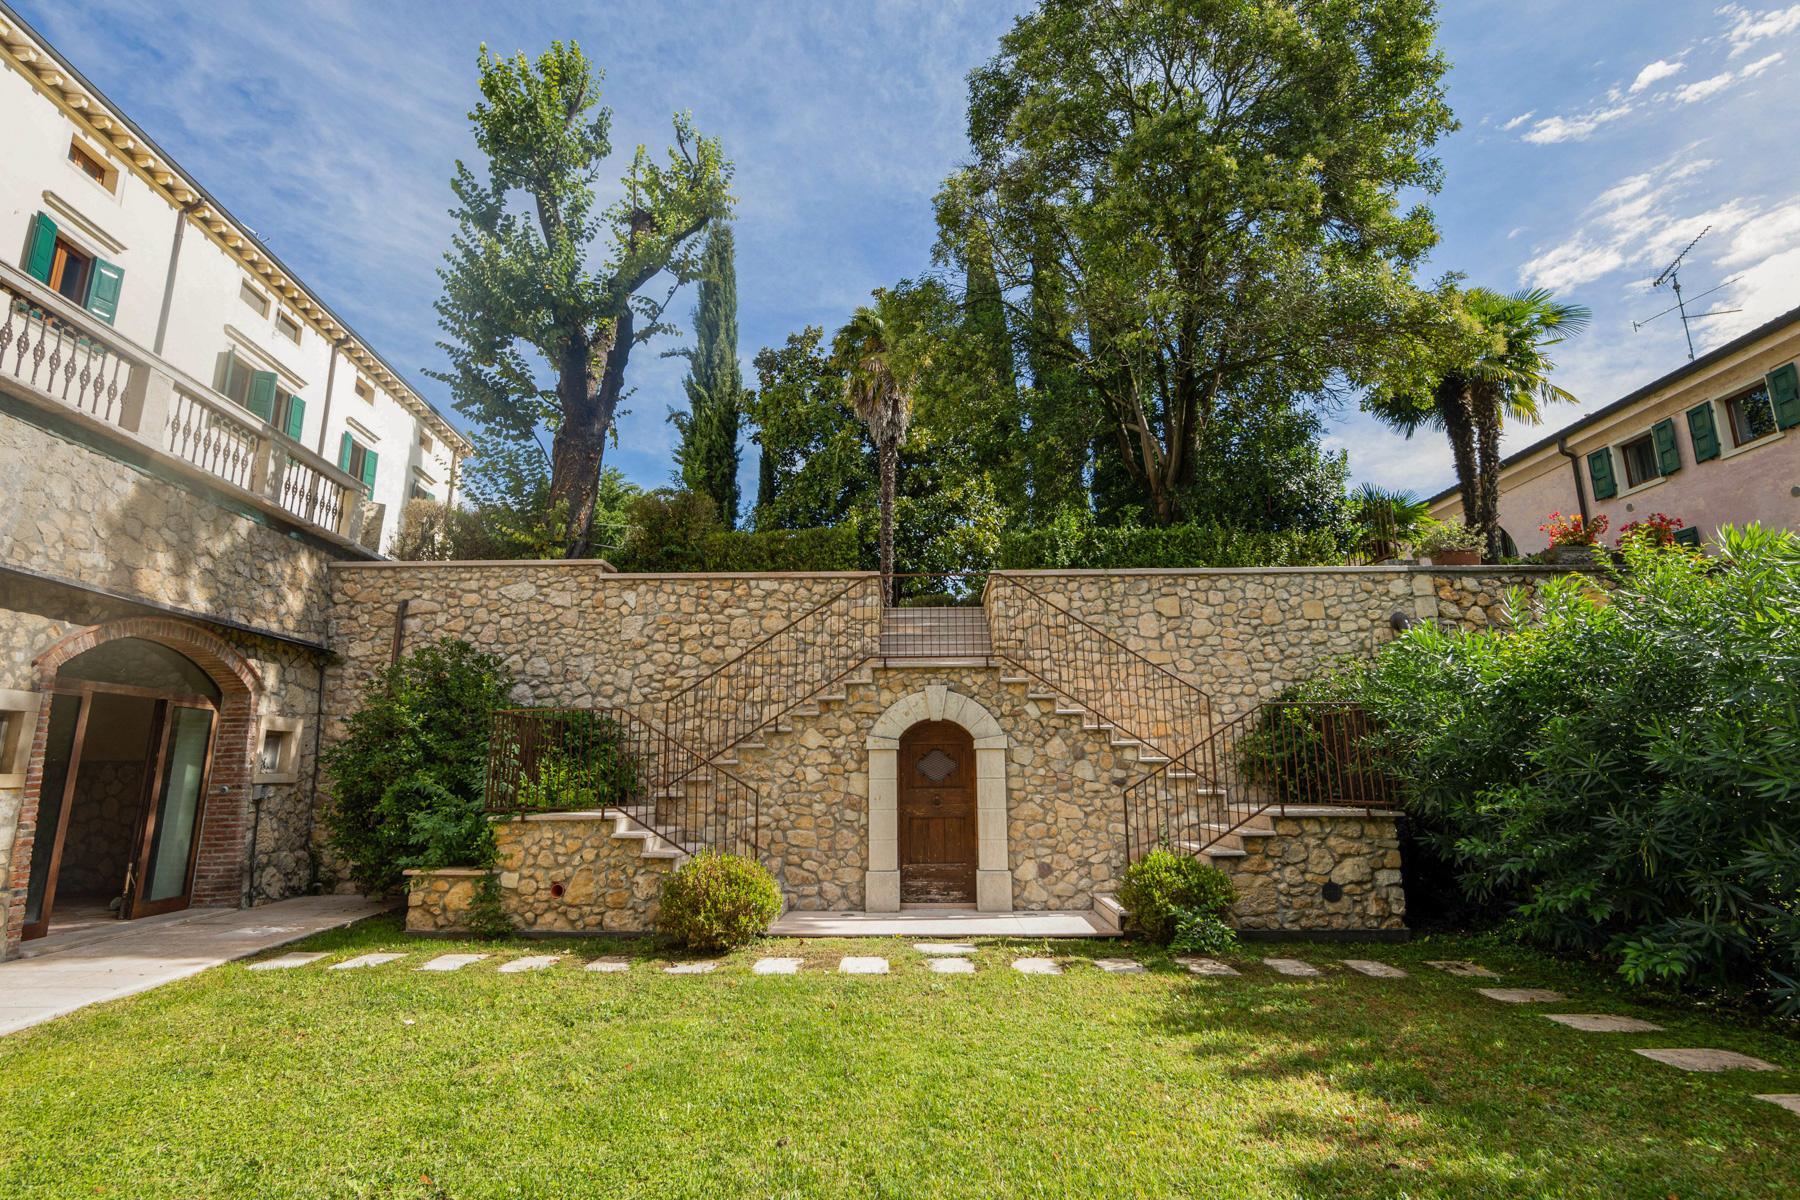 Villa historique dans la Valpolicella - 3